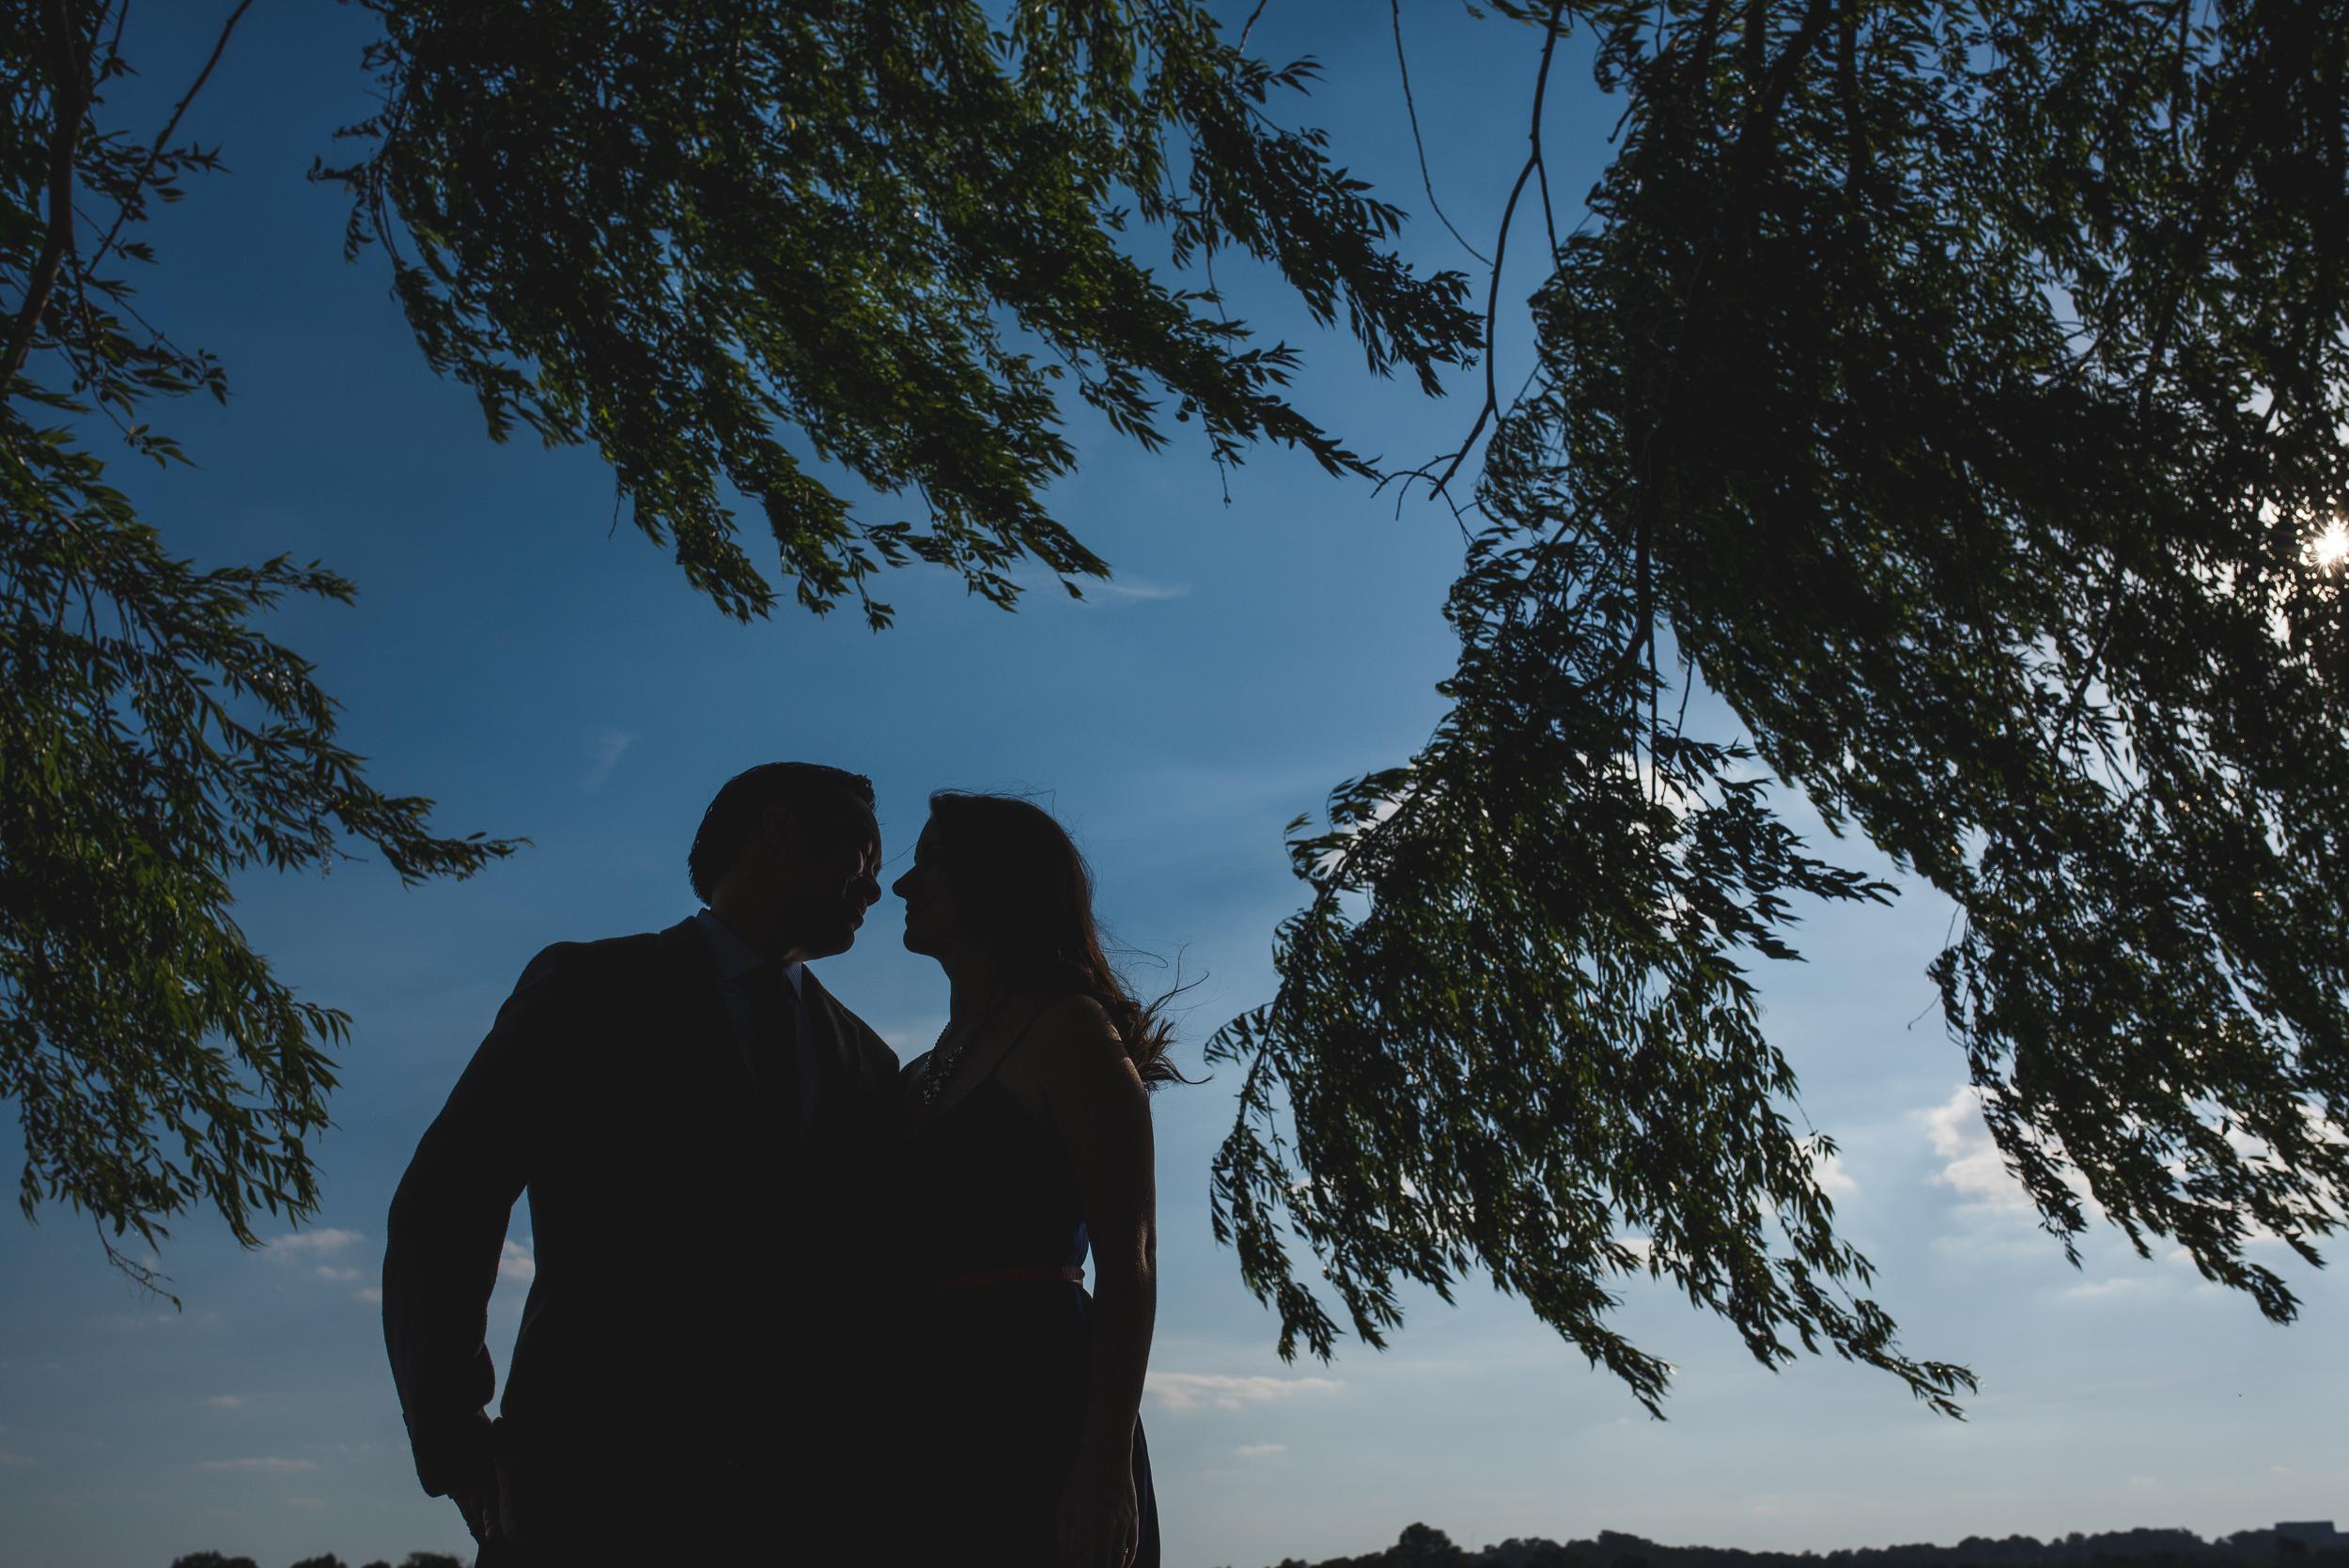 Best Engagement Photographer Washington DC Mantas Kubilinskas-6.jpg